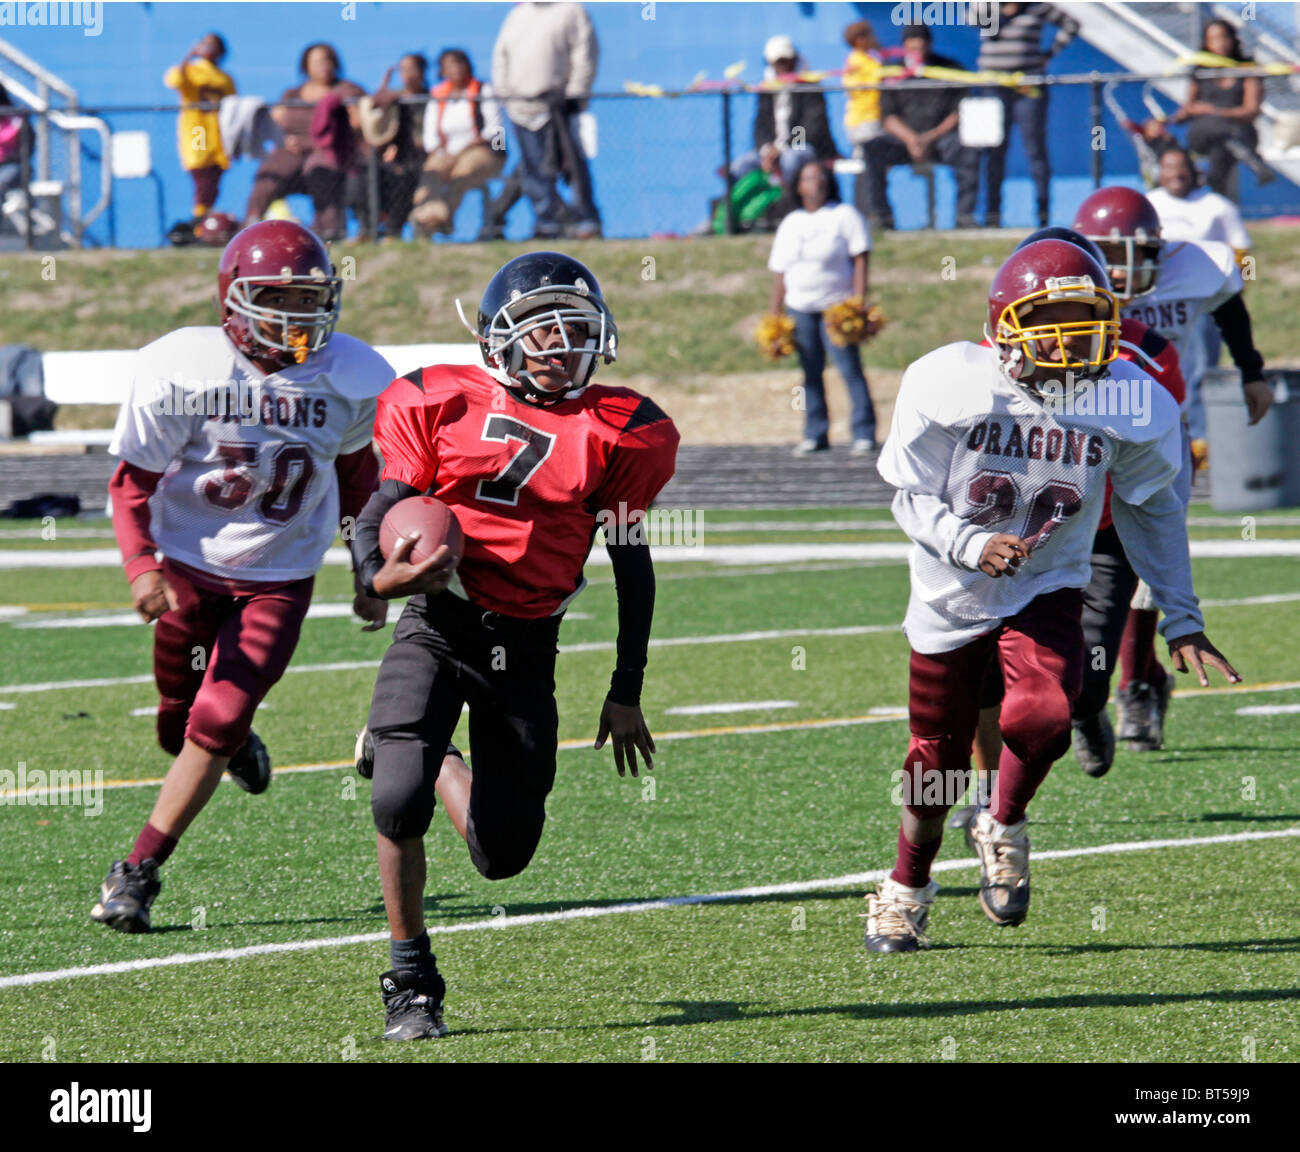 American football inner city league game in Roanoke, Virginia. - Stock Image